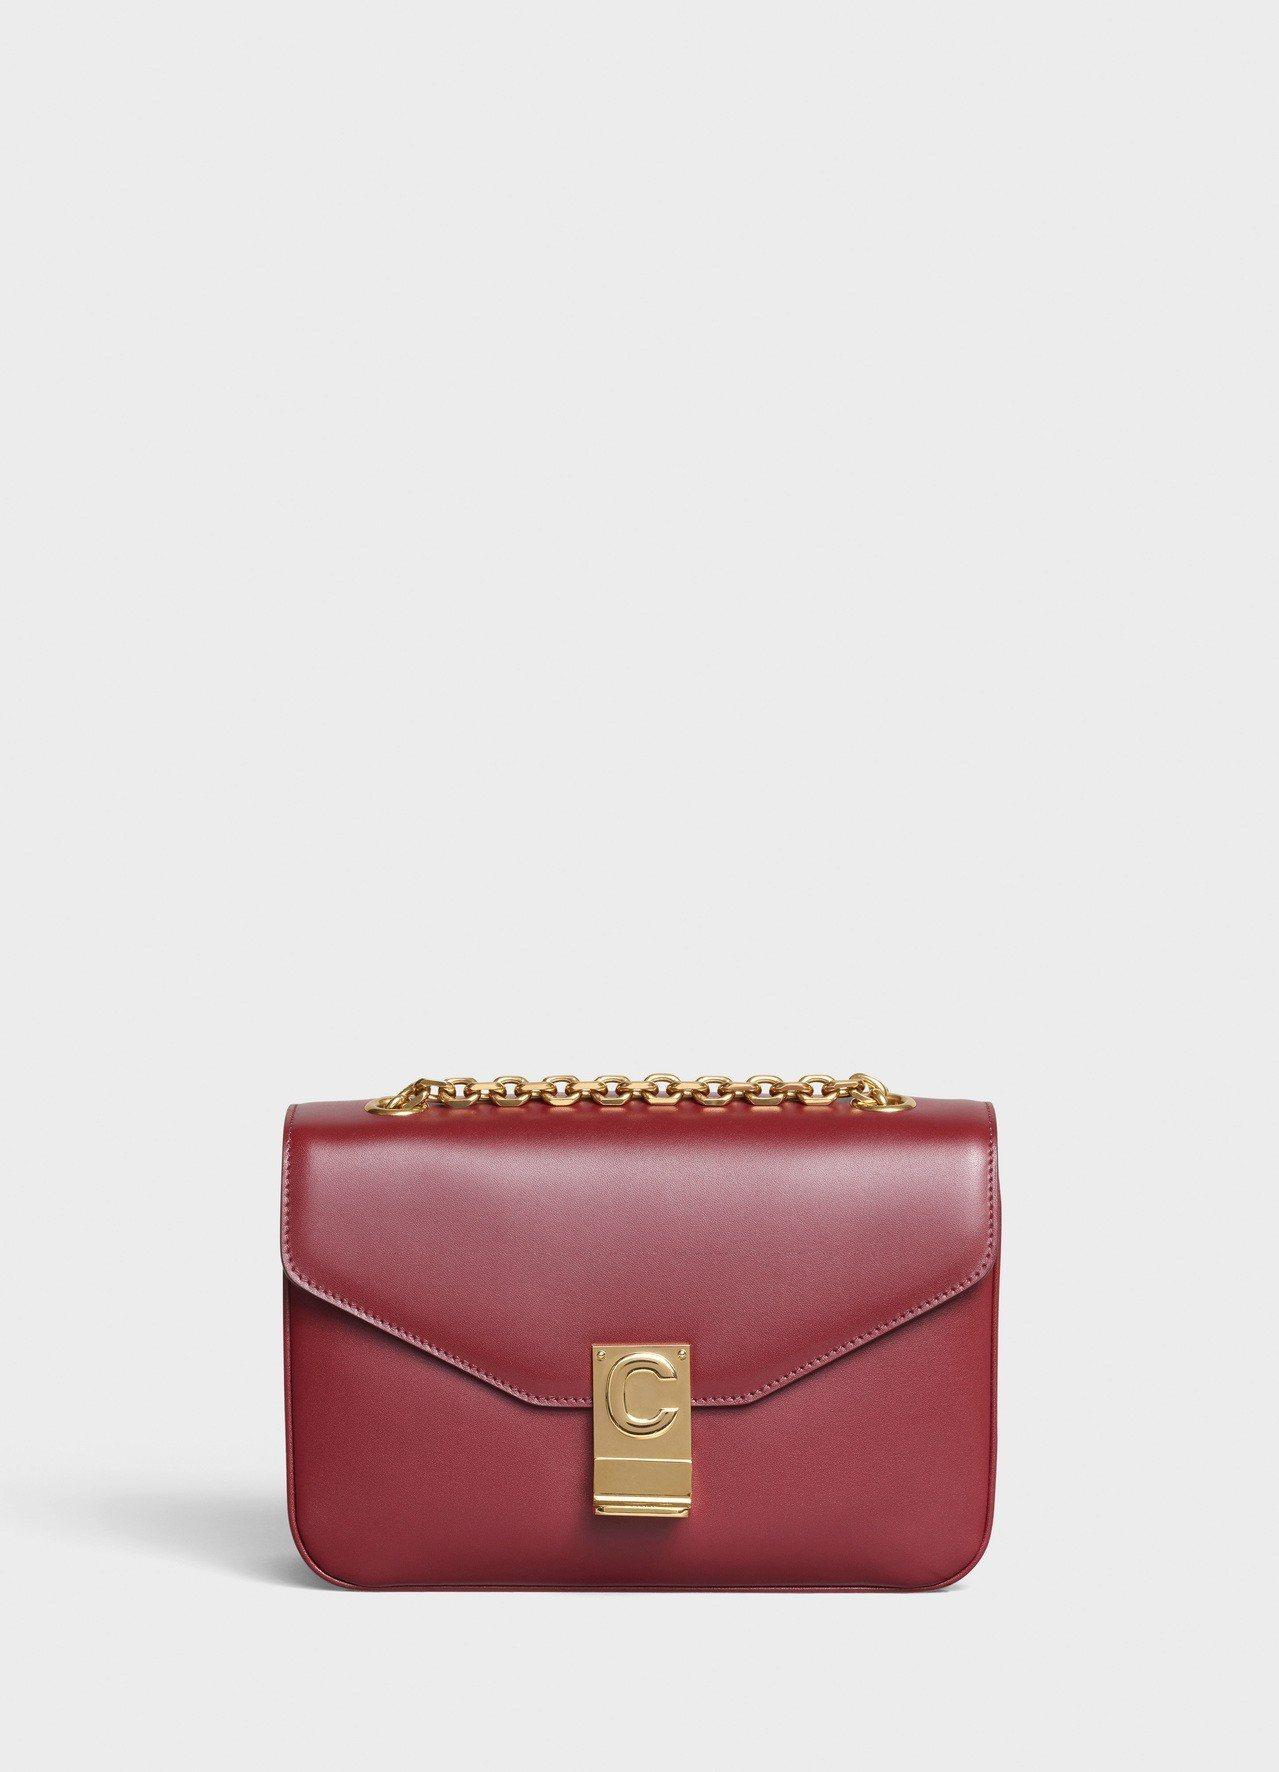 C Bag淡酒紅光滑小牛皮中型鍊帶包,售價99,000元。圖/CELINE BY...